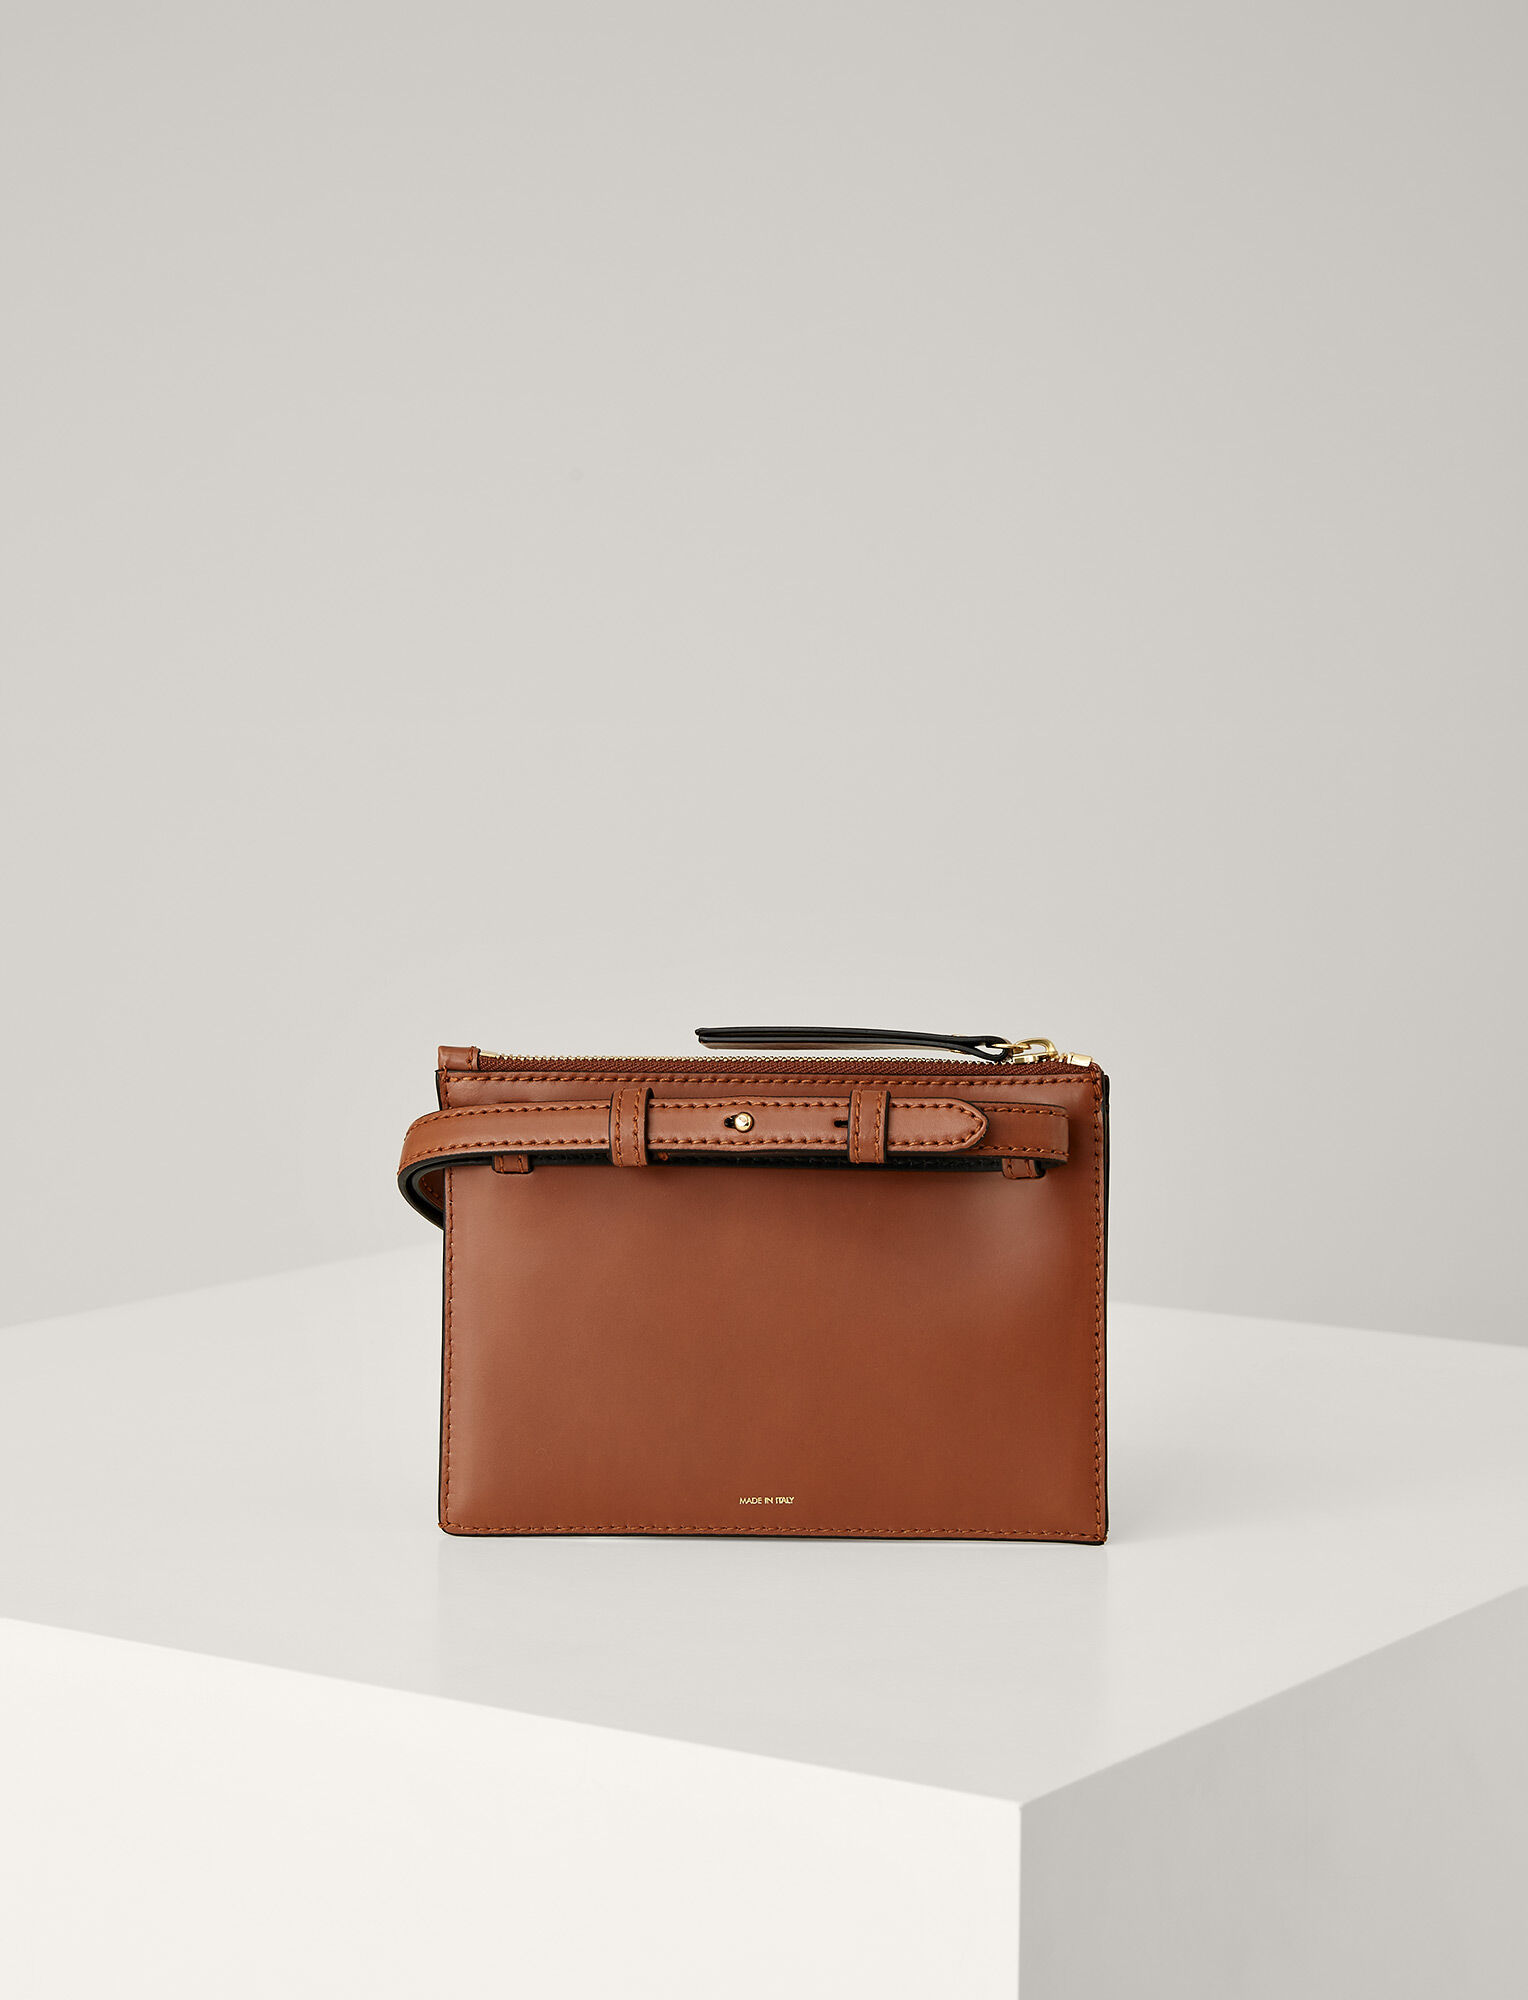 Joseph, Leather Montmartre Bag, in SADDLE